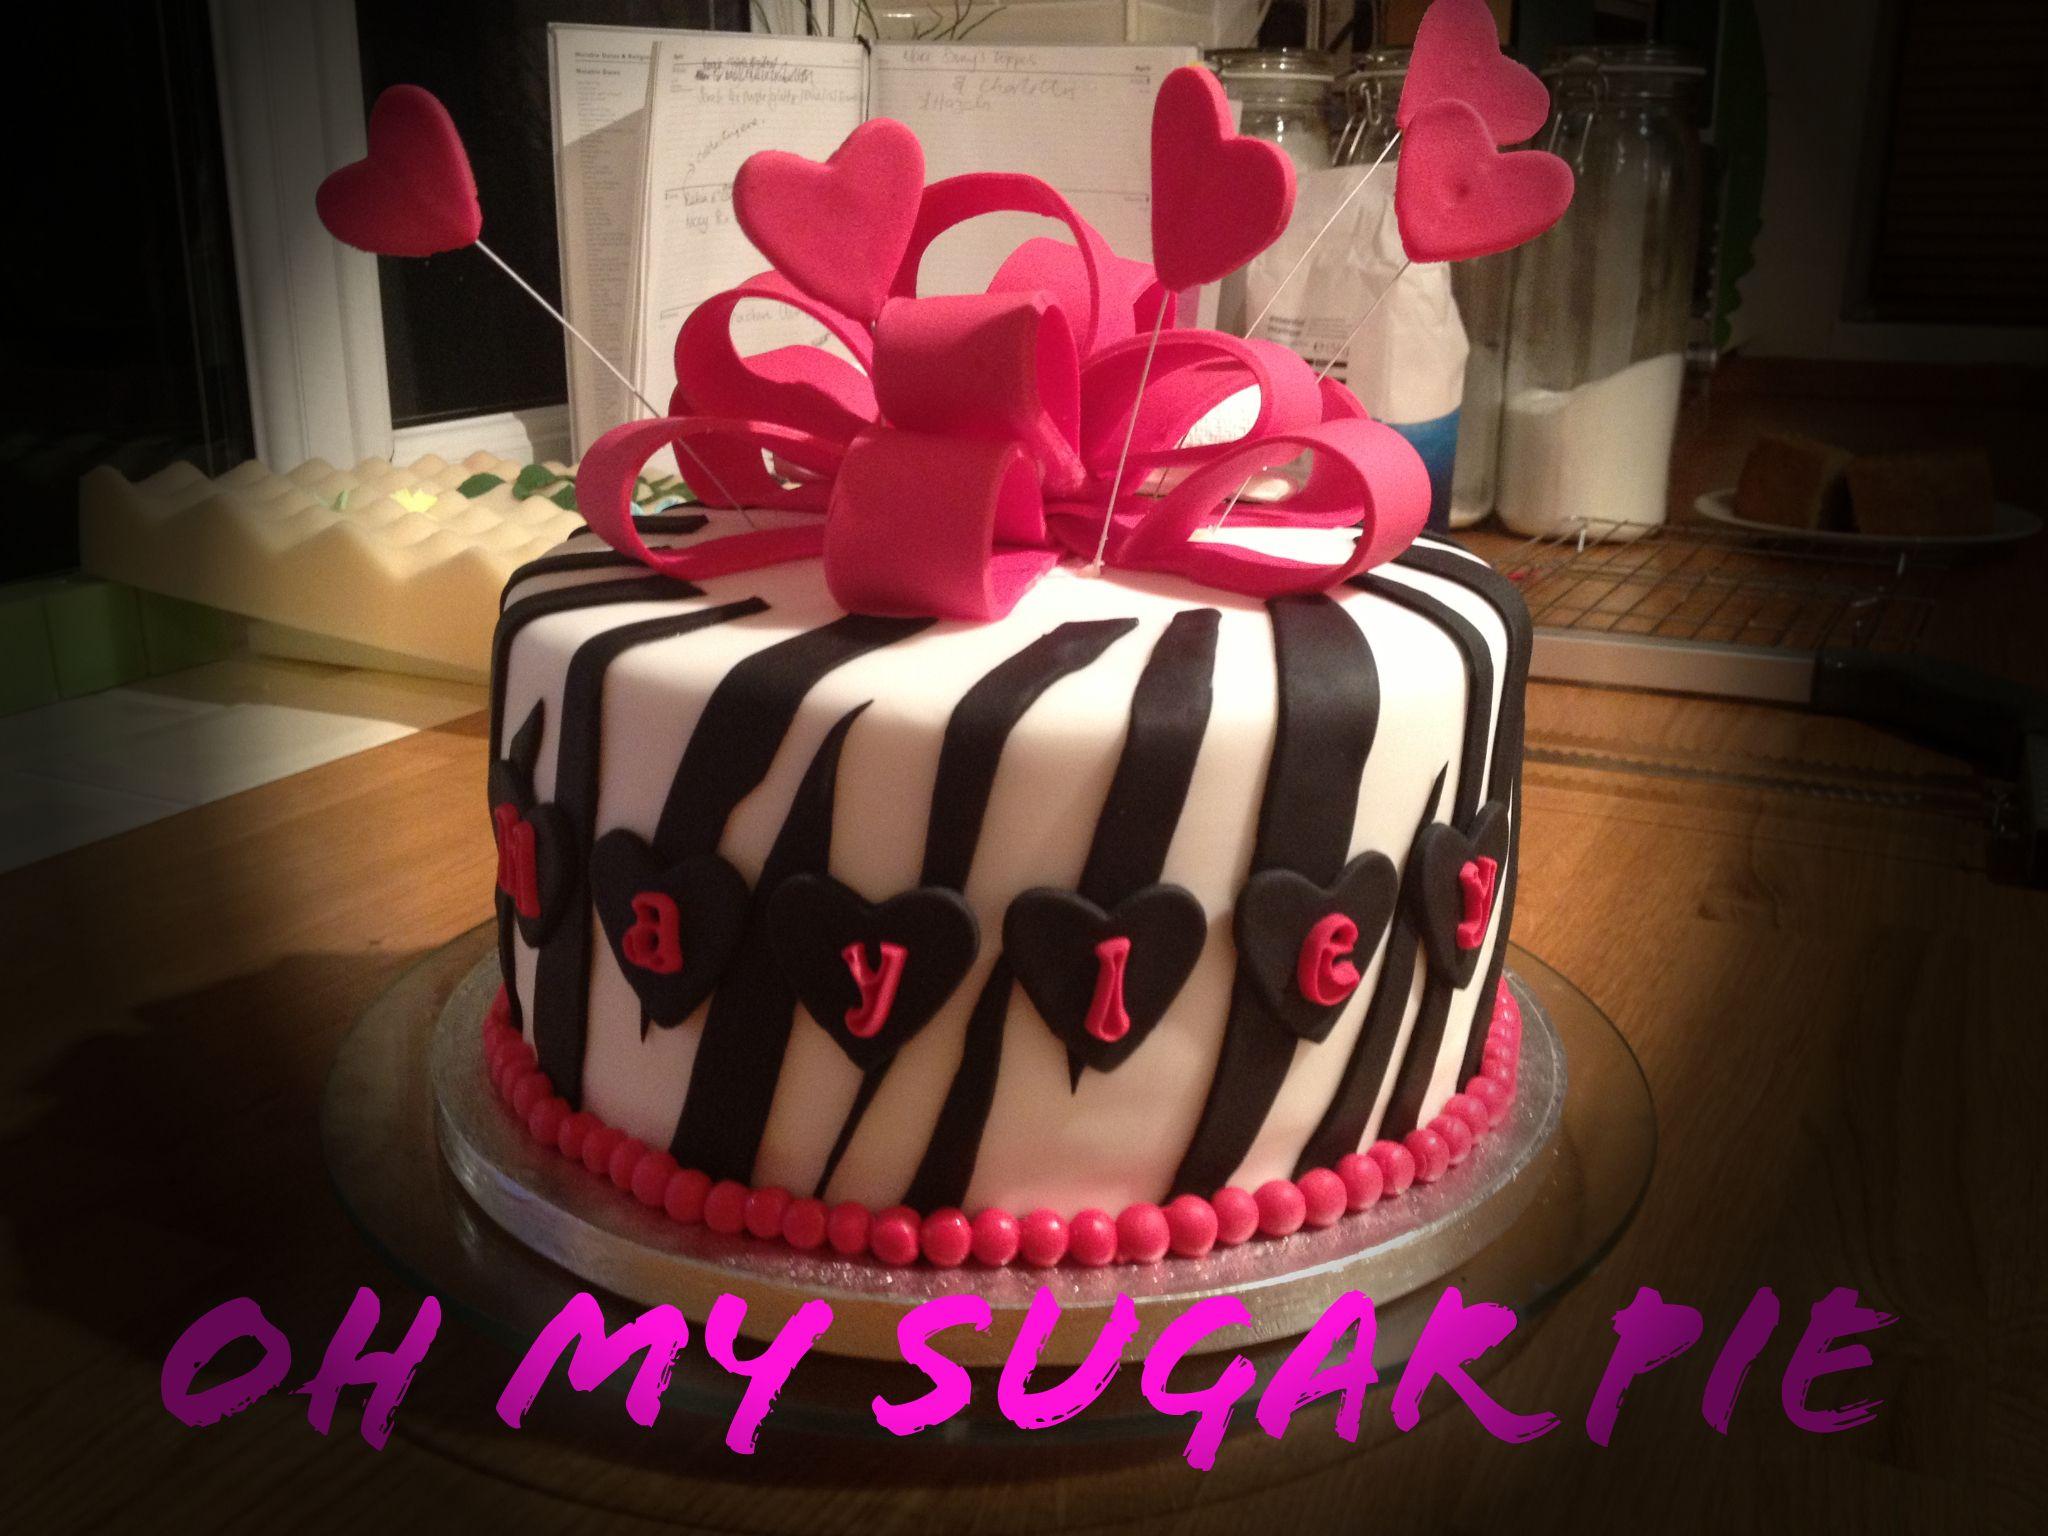 Girly Birthday Cake by OH MY Sugar Pie x #girly #pink #zebra #stripe #bows #ribbon #hearts #birthday #cake